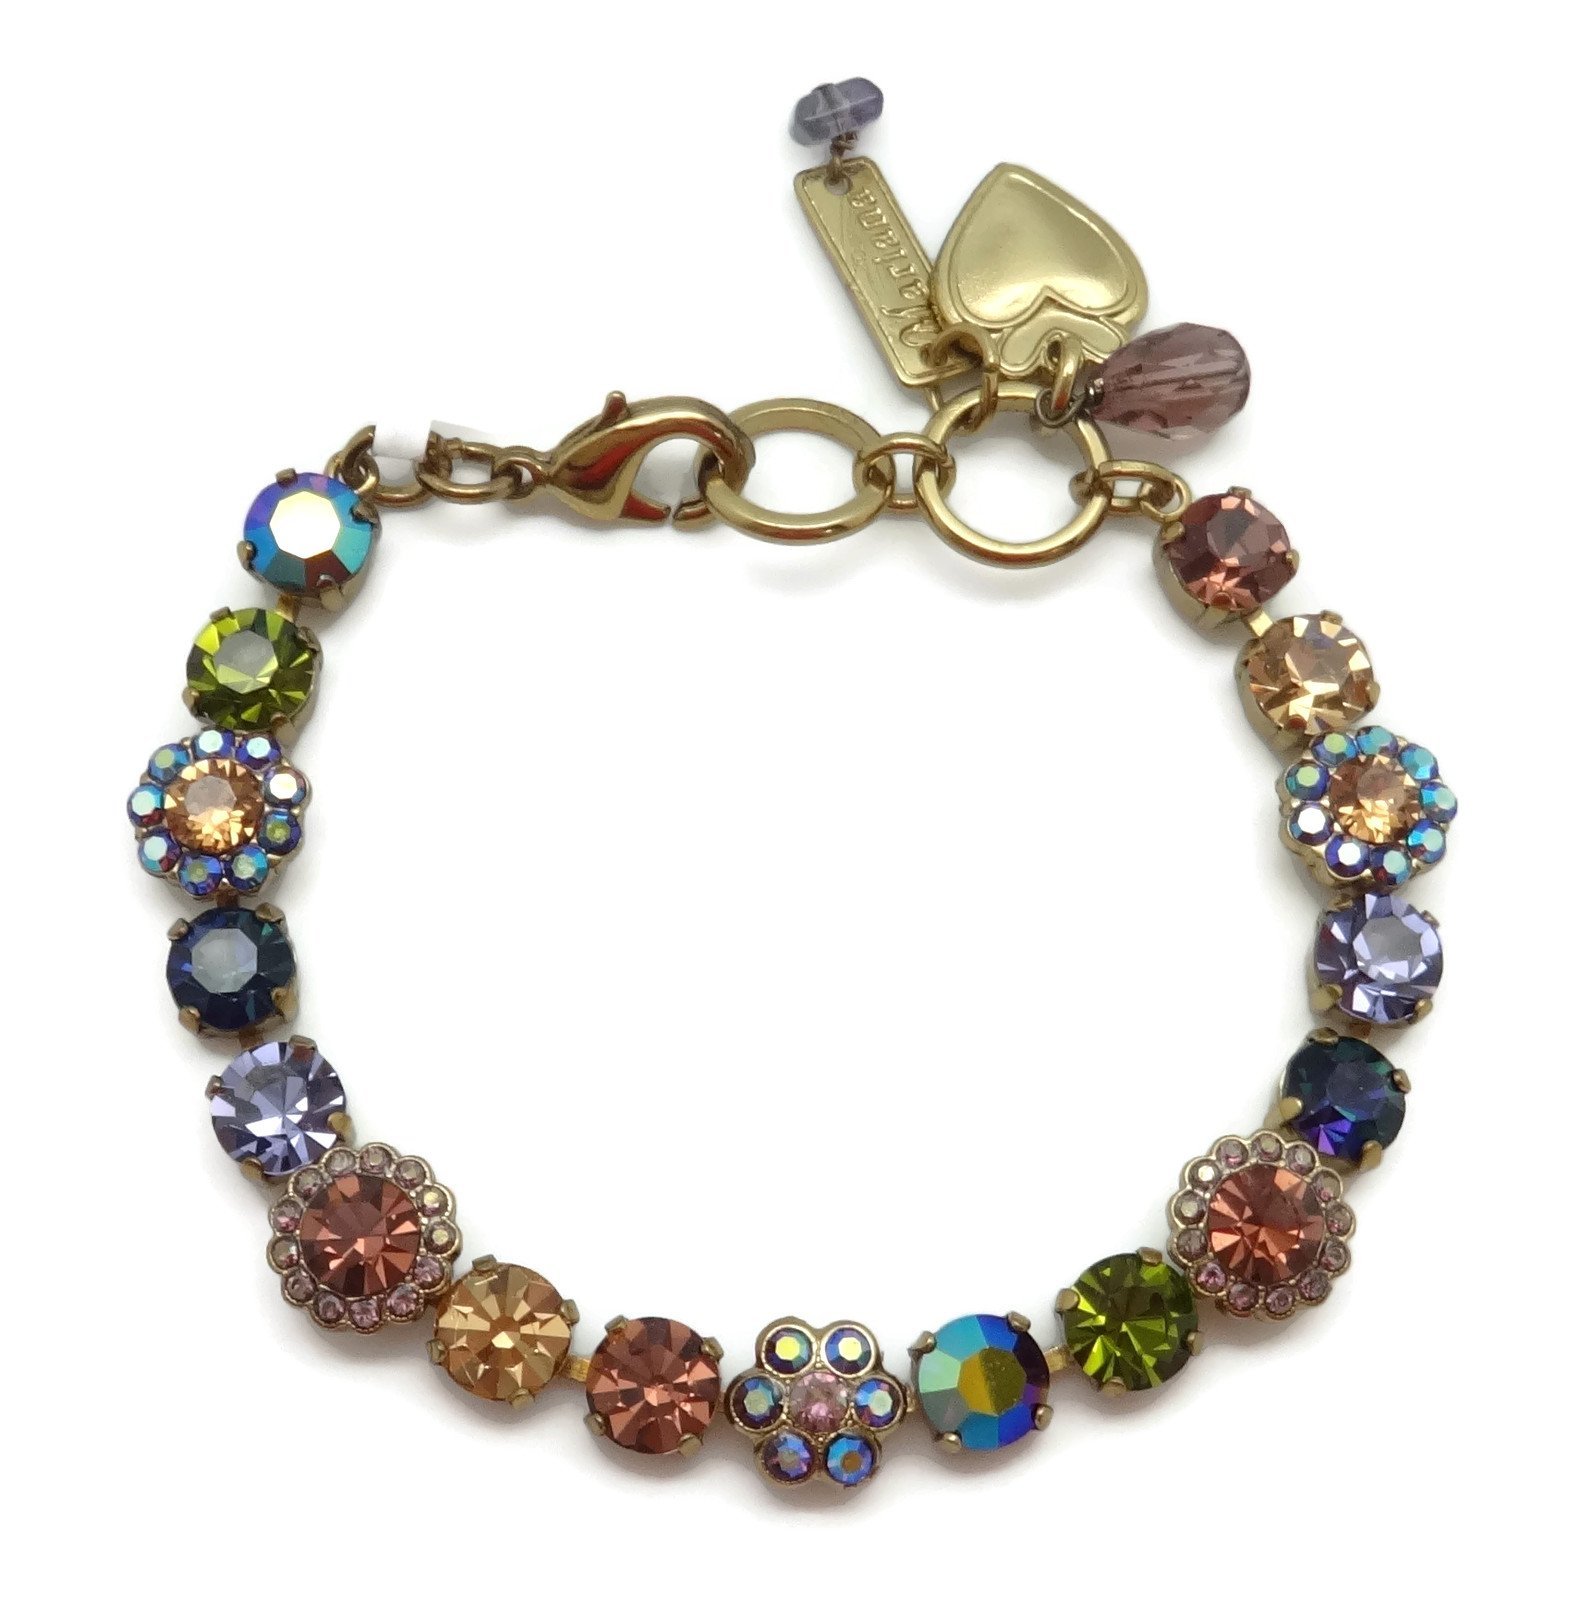 Mariana Swarovski Crystal English Gold Plated Bracelet Multi Color Mosaic 1089 Odyssey Penelope